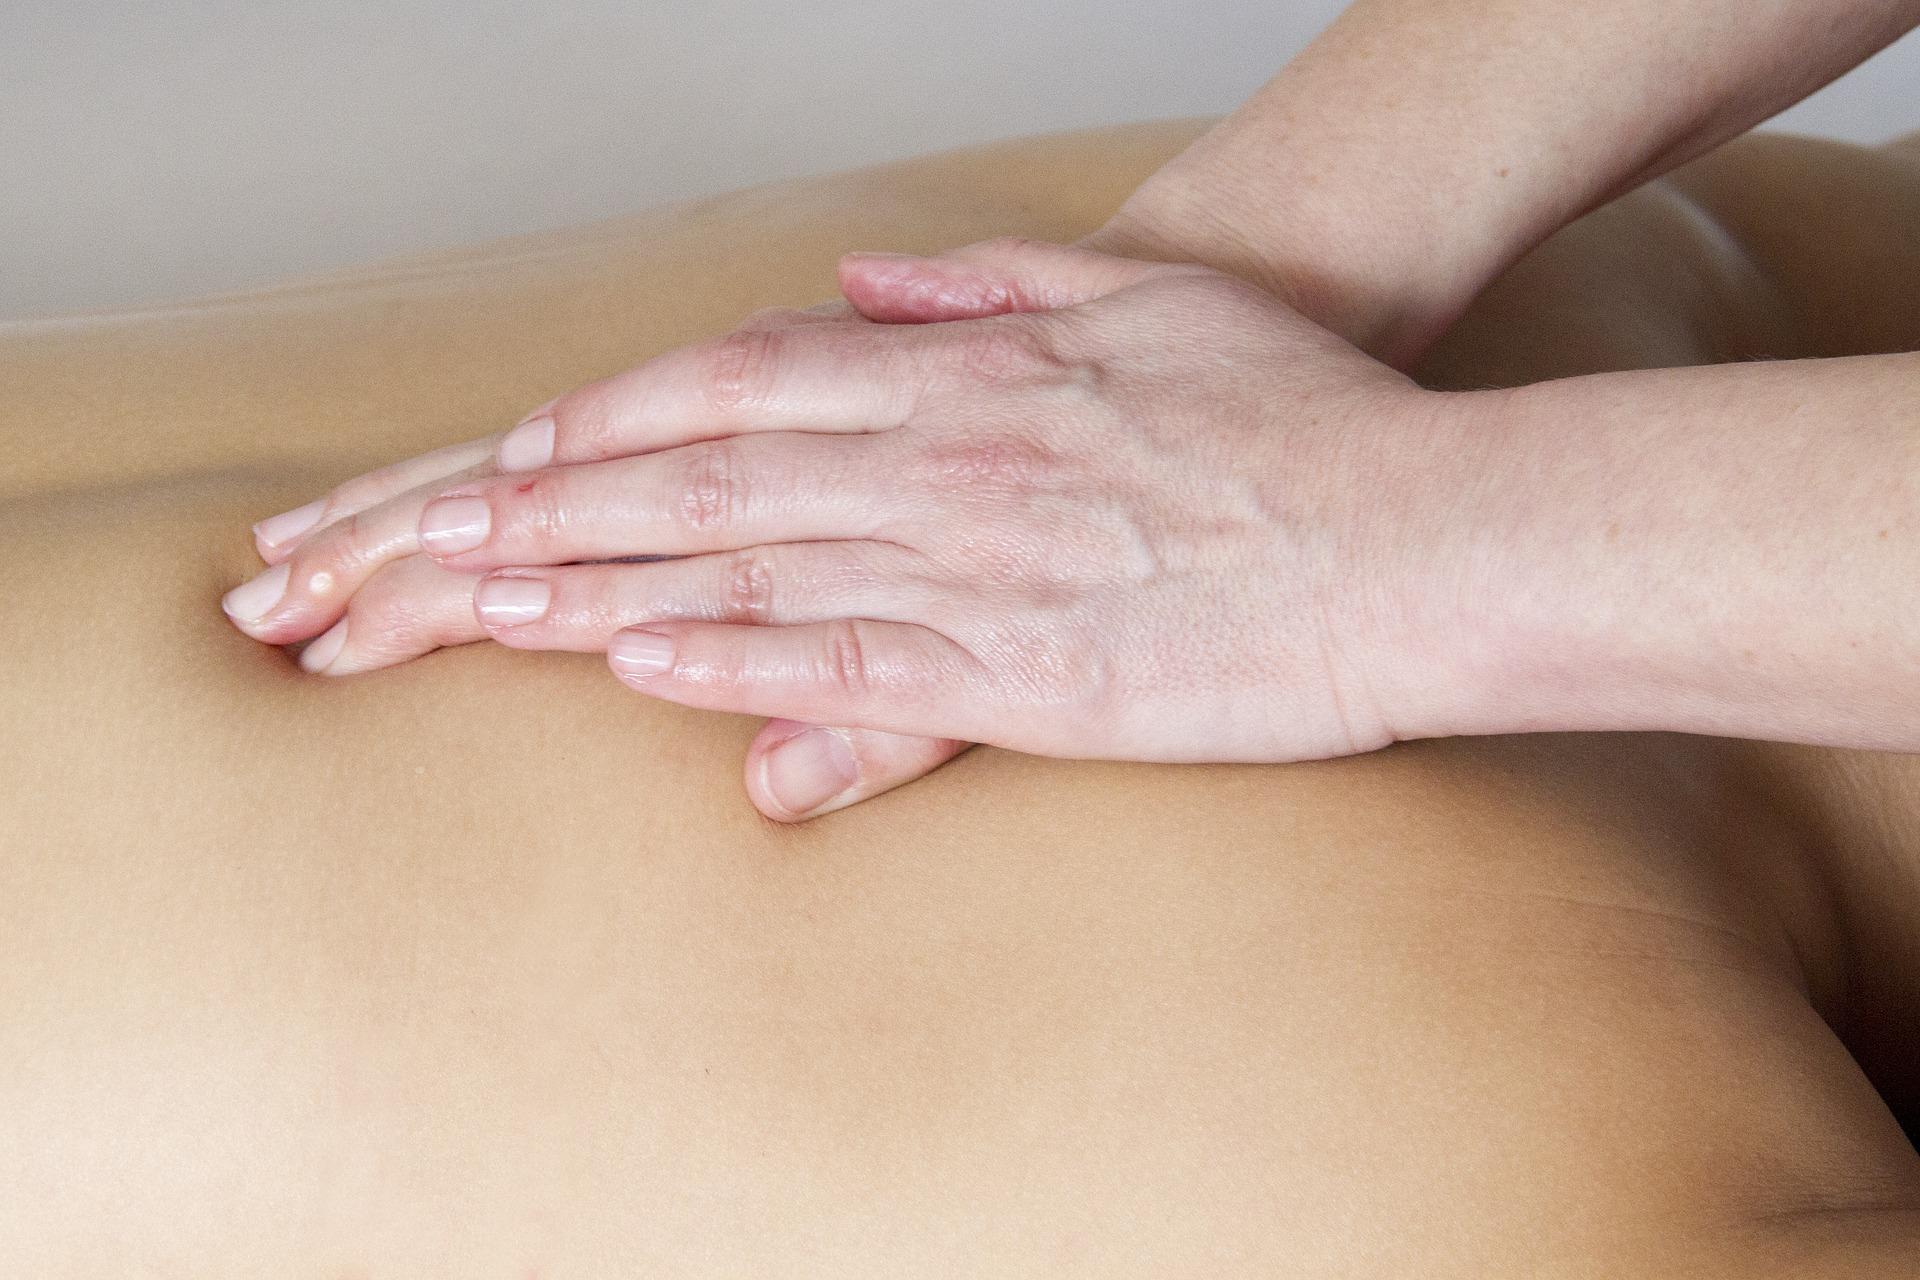 massage confiance toucher